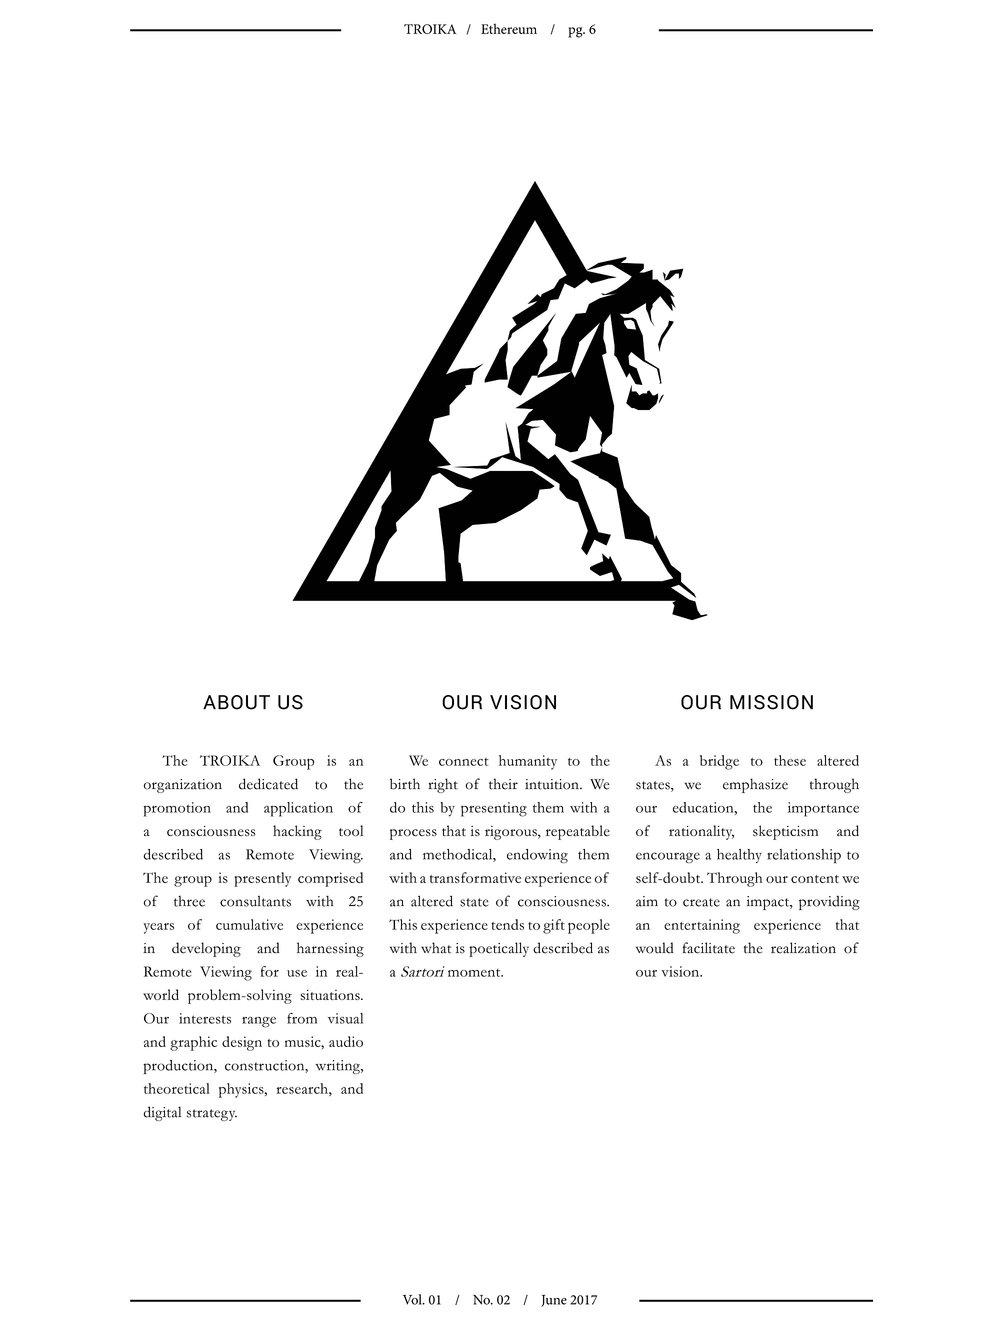 TROIKA-Ethereum-Report-6.jpg